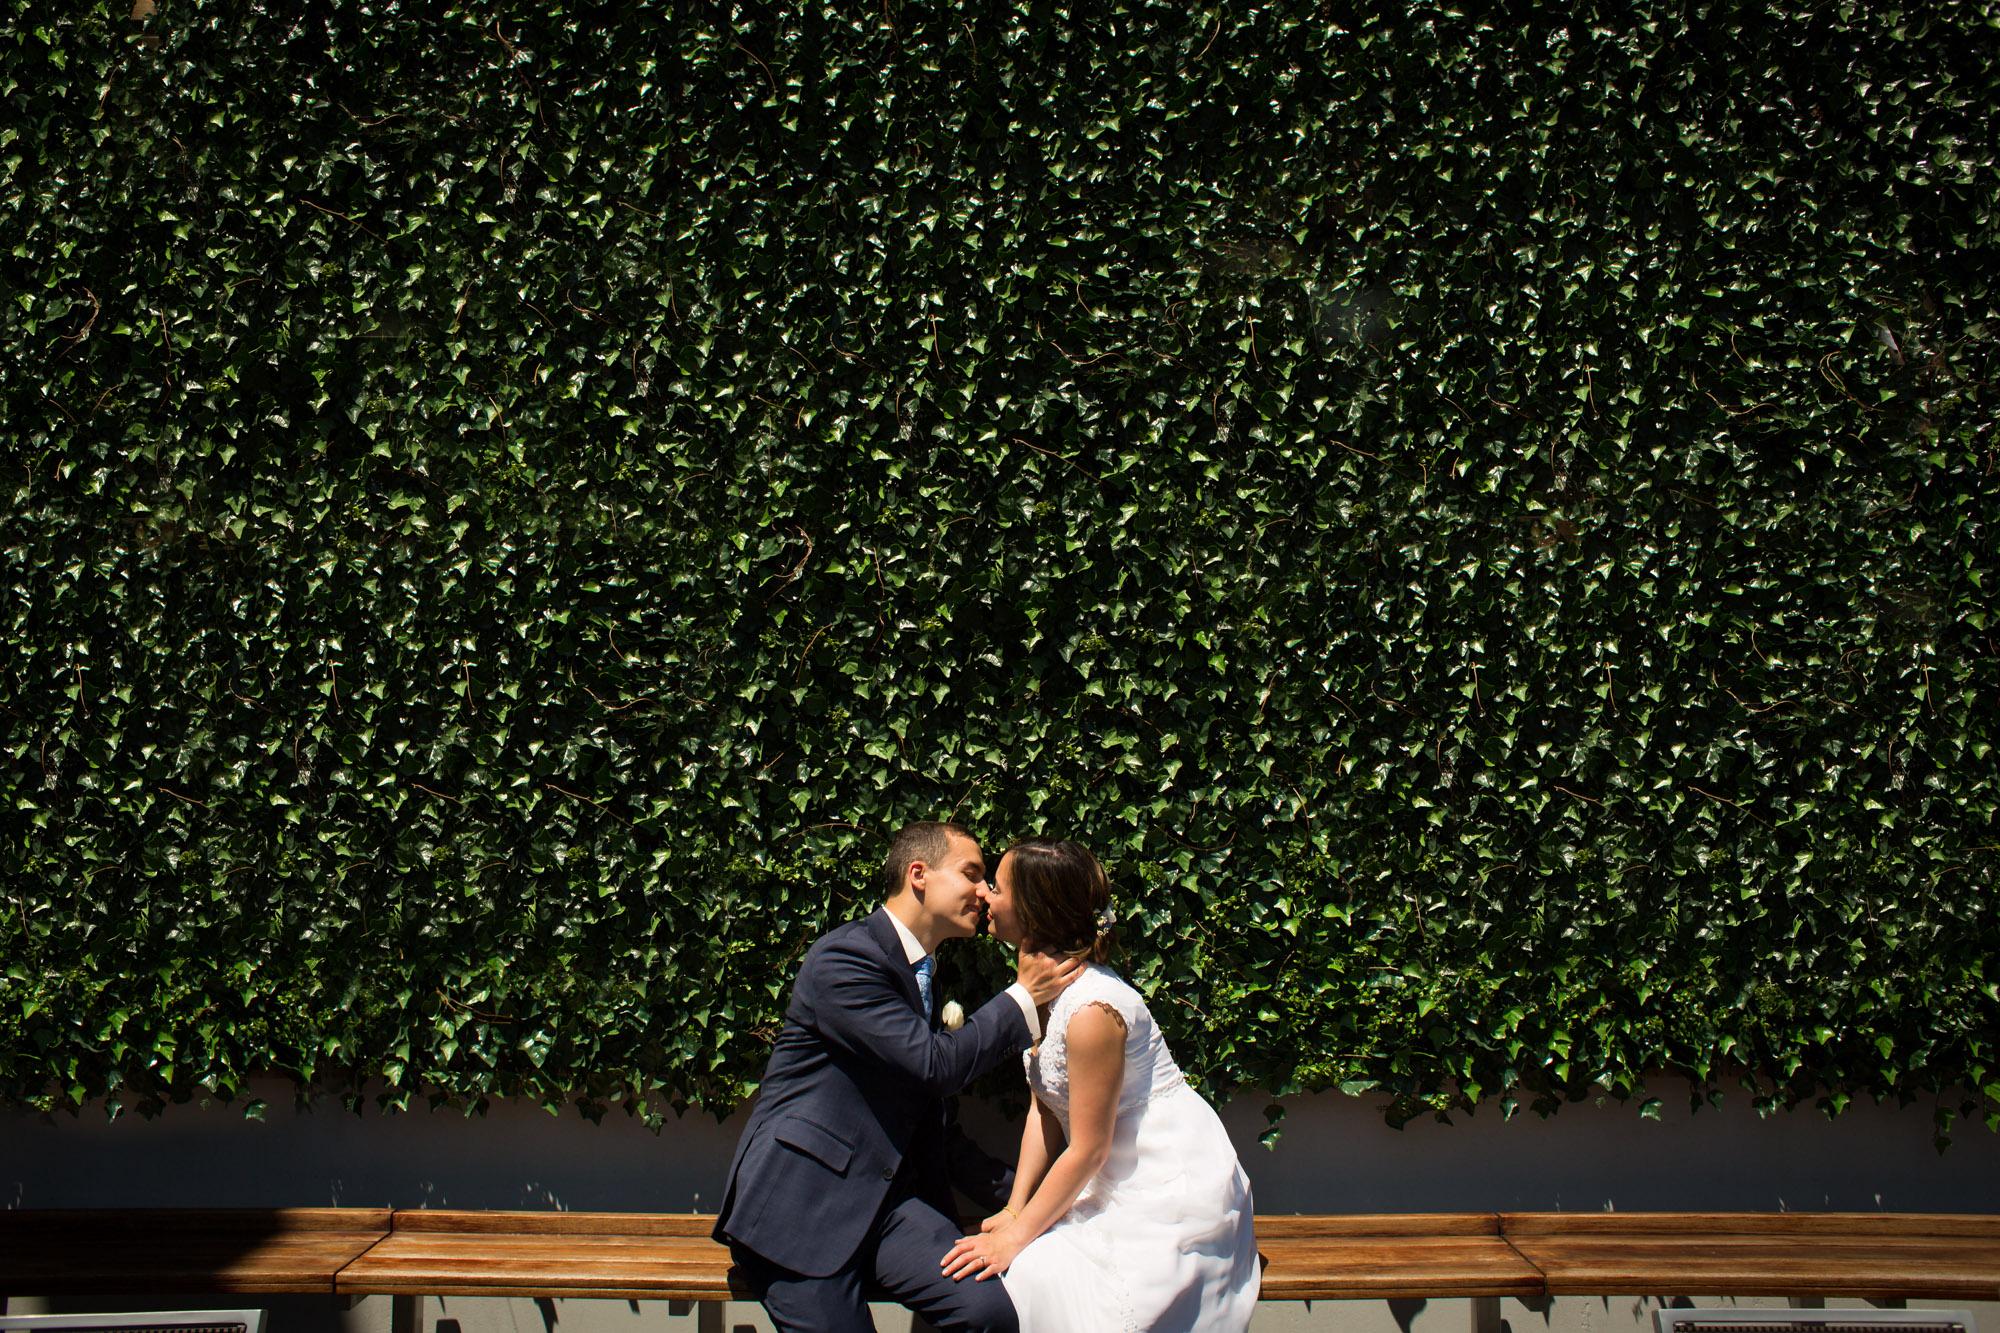 lam-chicago-wedding-photos-23.jpg